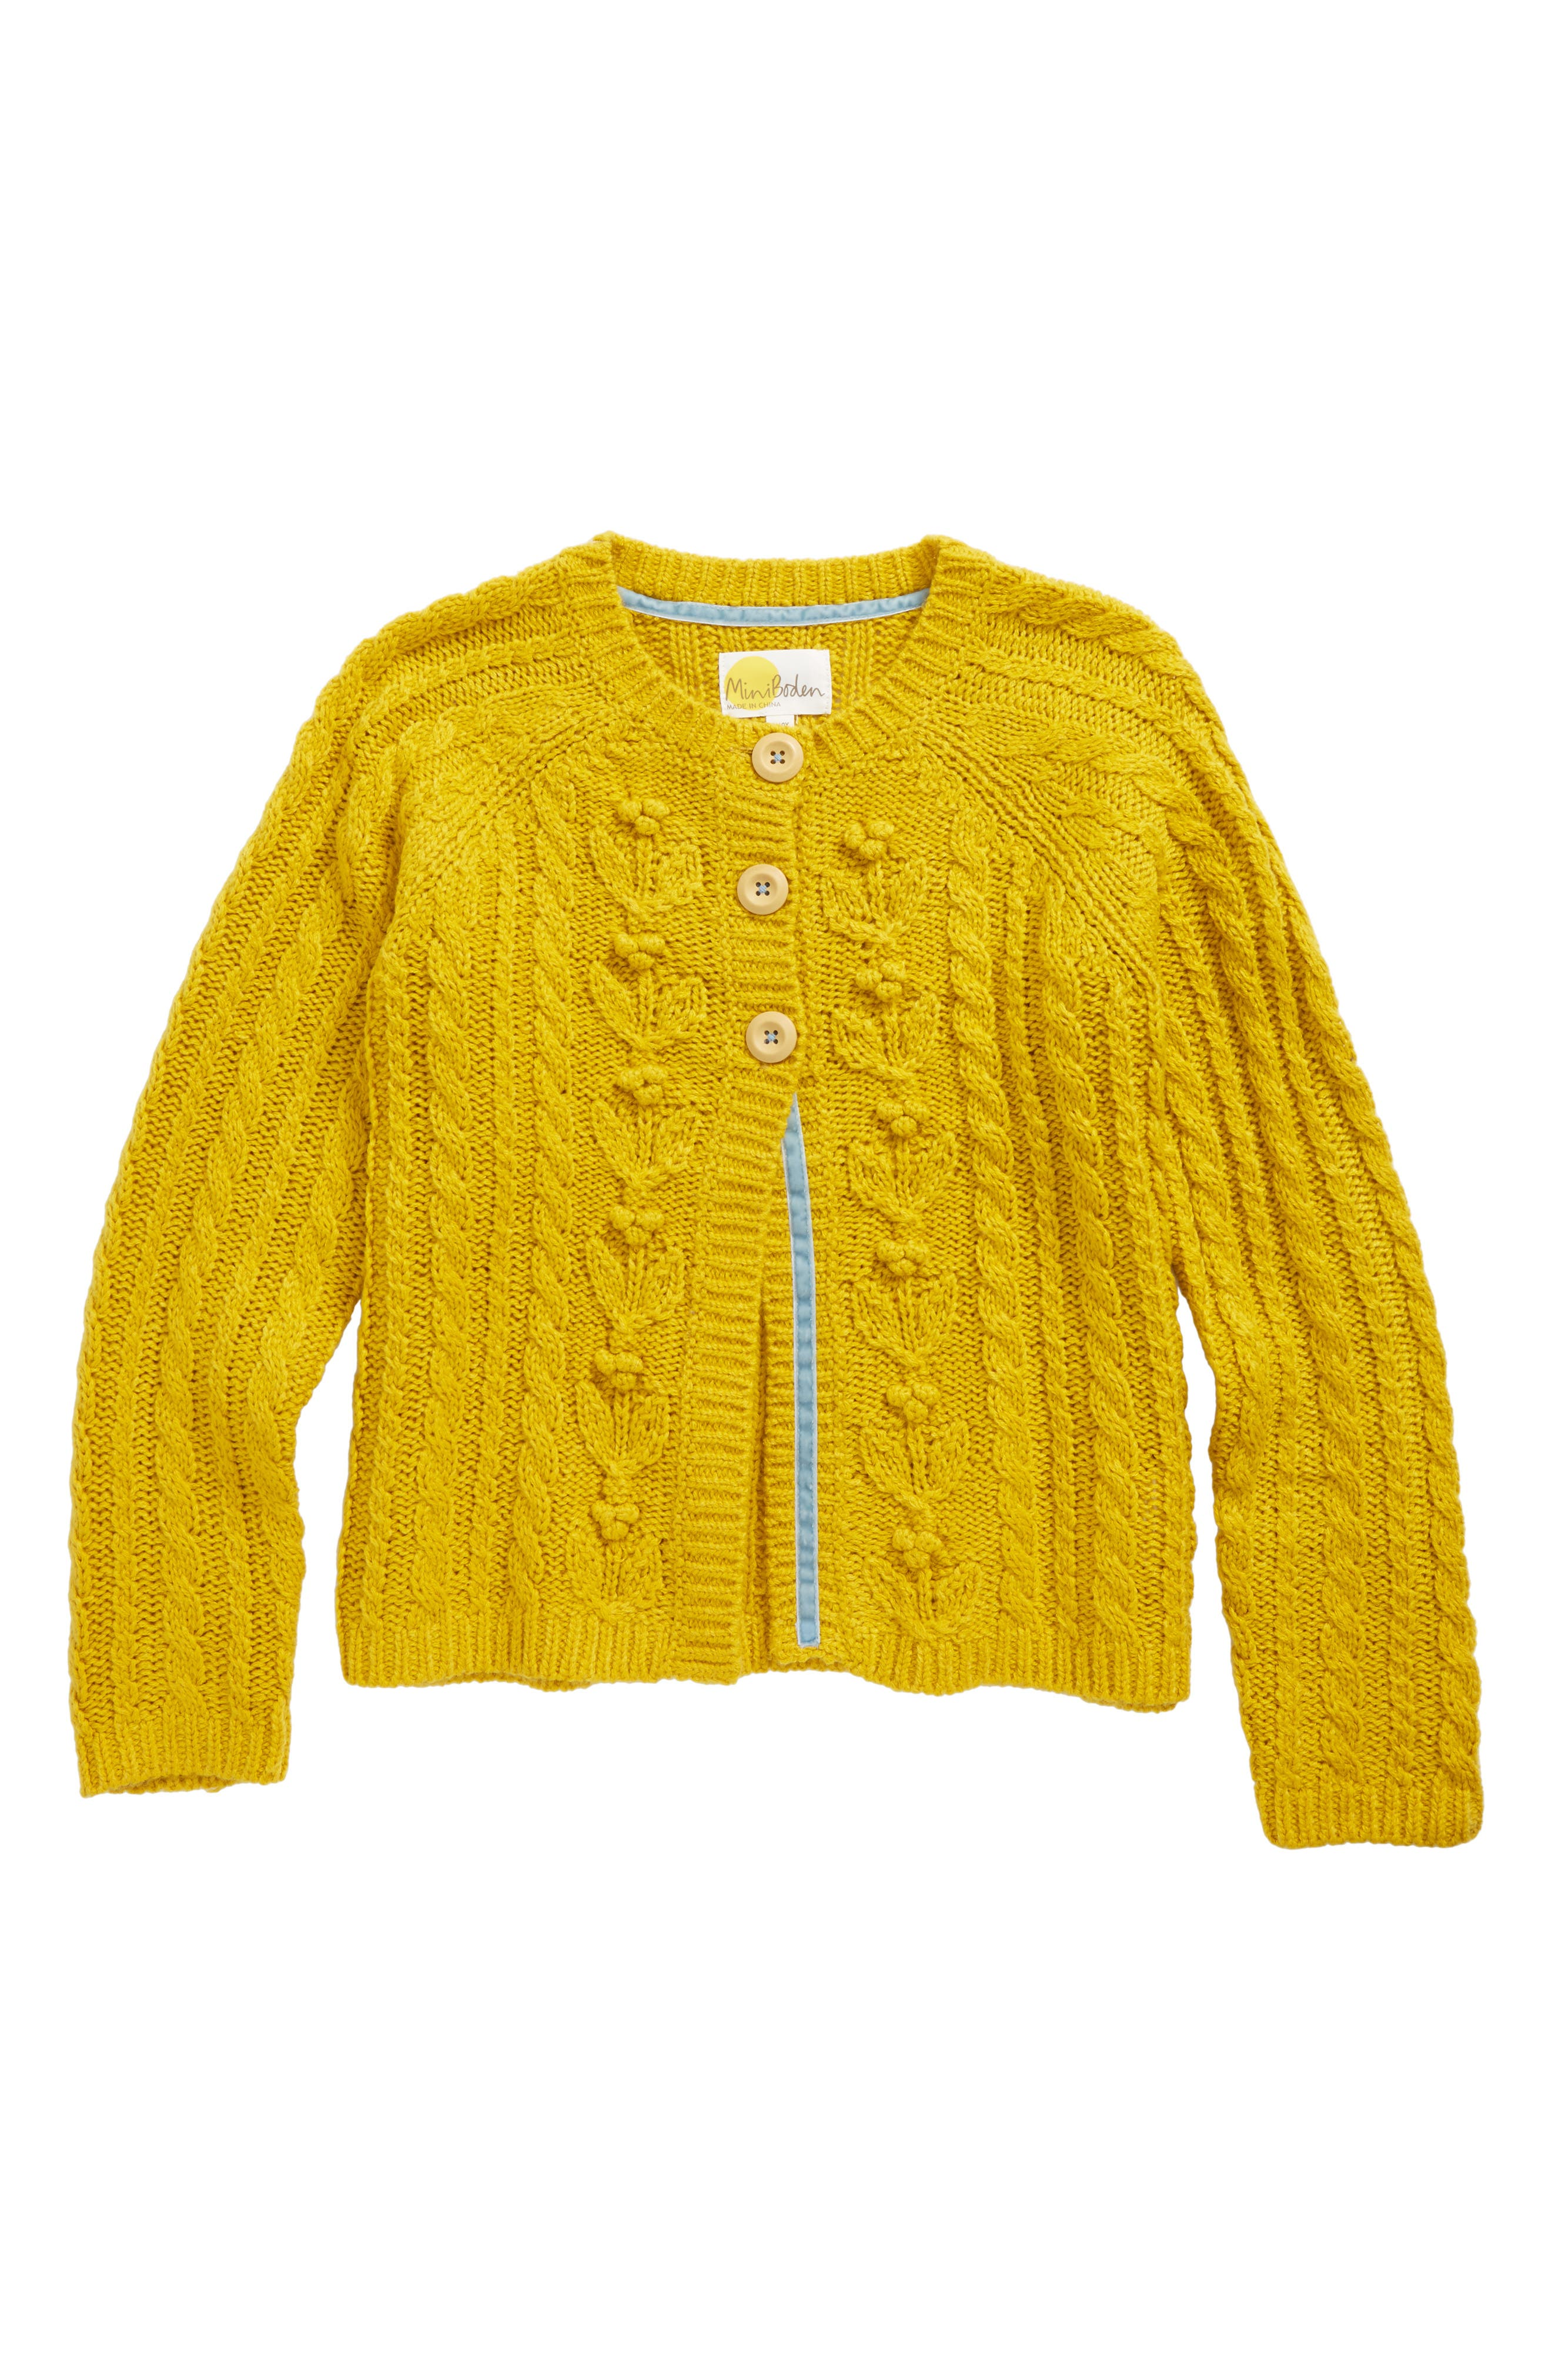 Alternate Image 1 Selected - Mini Boden Cable Knit Cardigan (Toddler Girls, Little Girls & Big Girls)